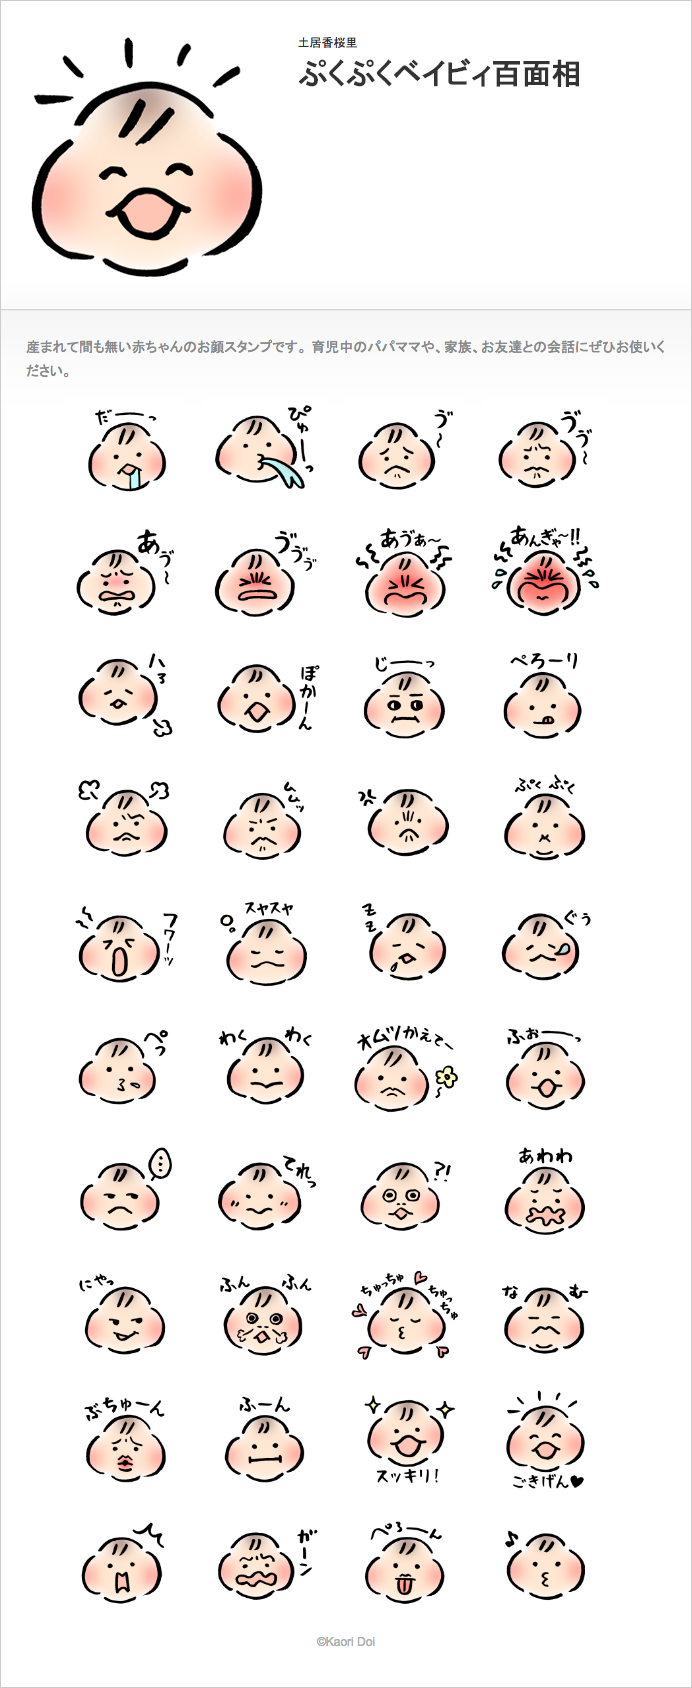 LINEスタンプ「ぷくぷくベイビィ百面相」